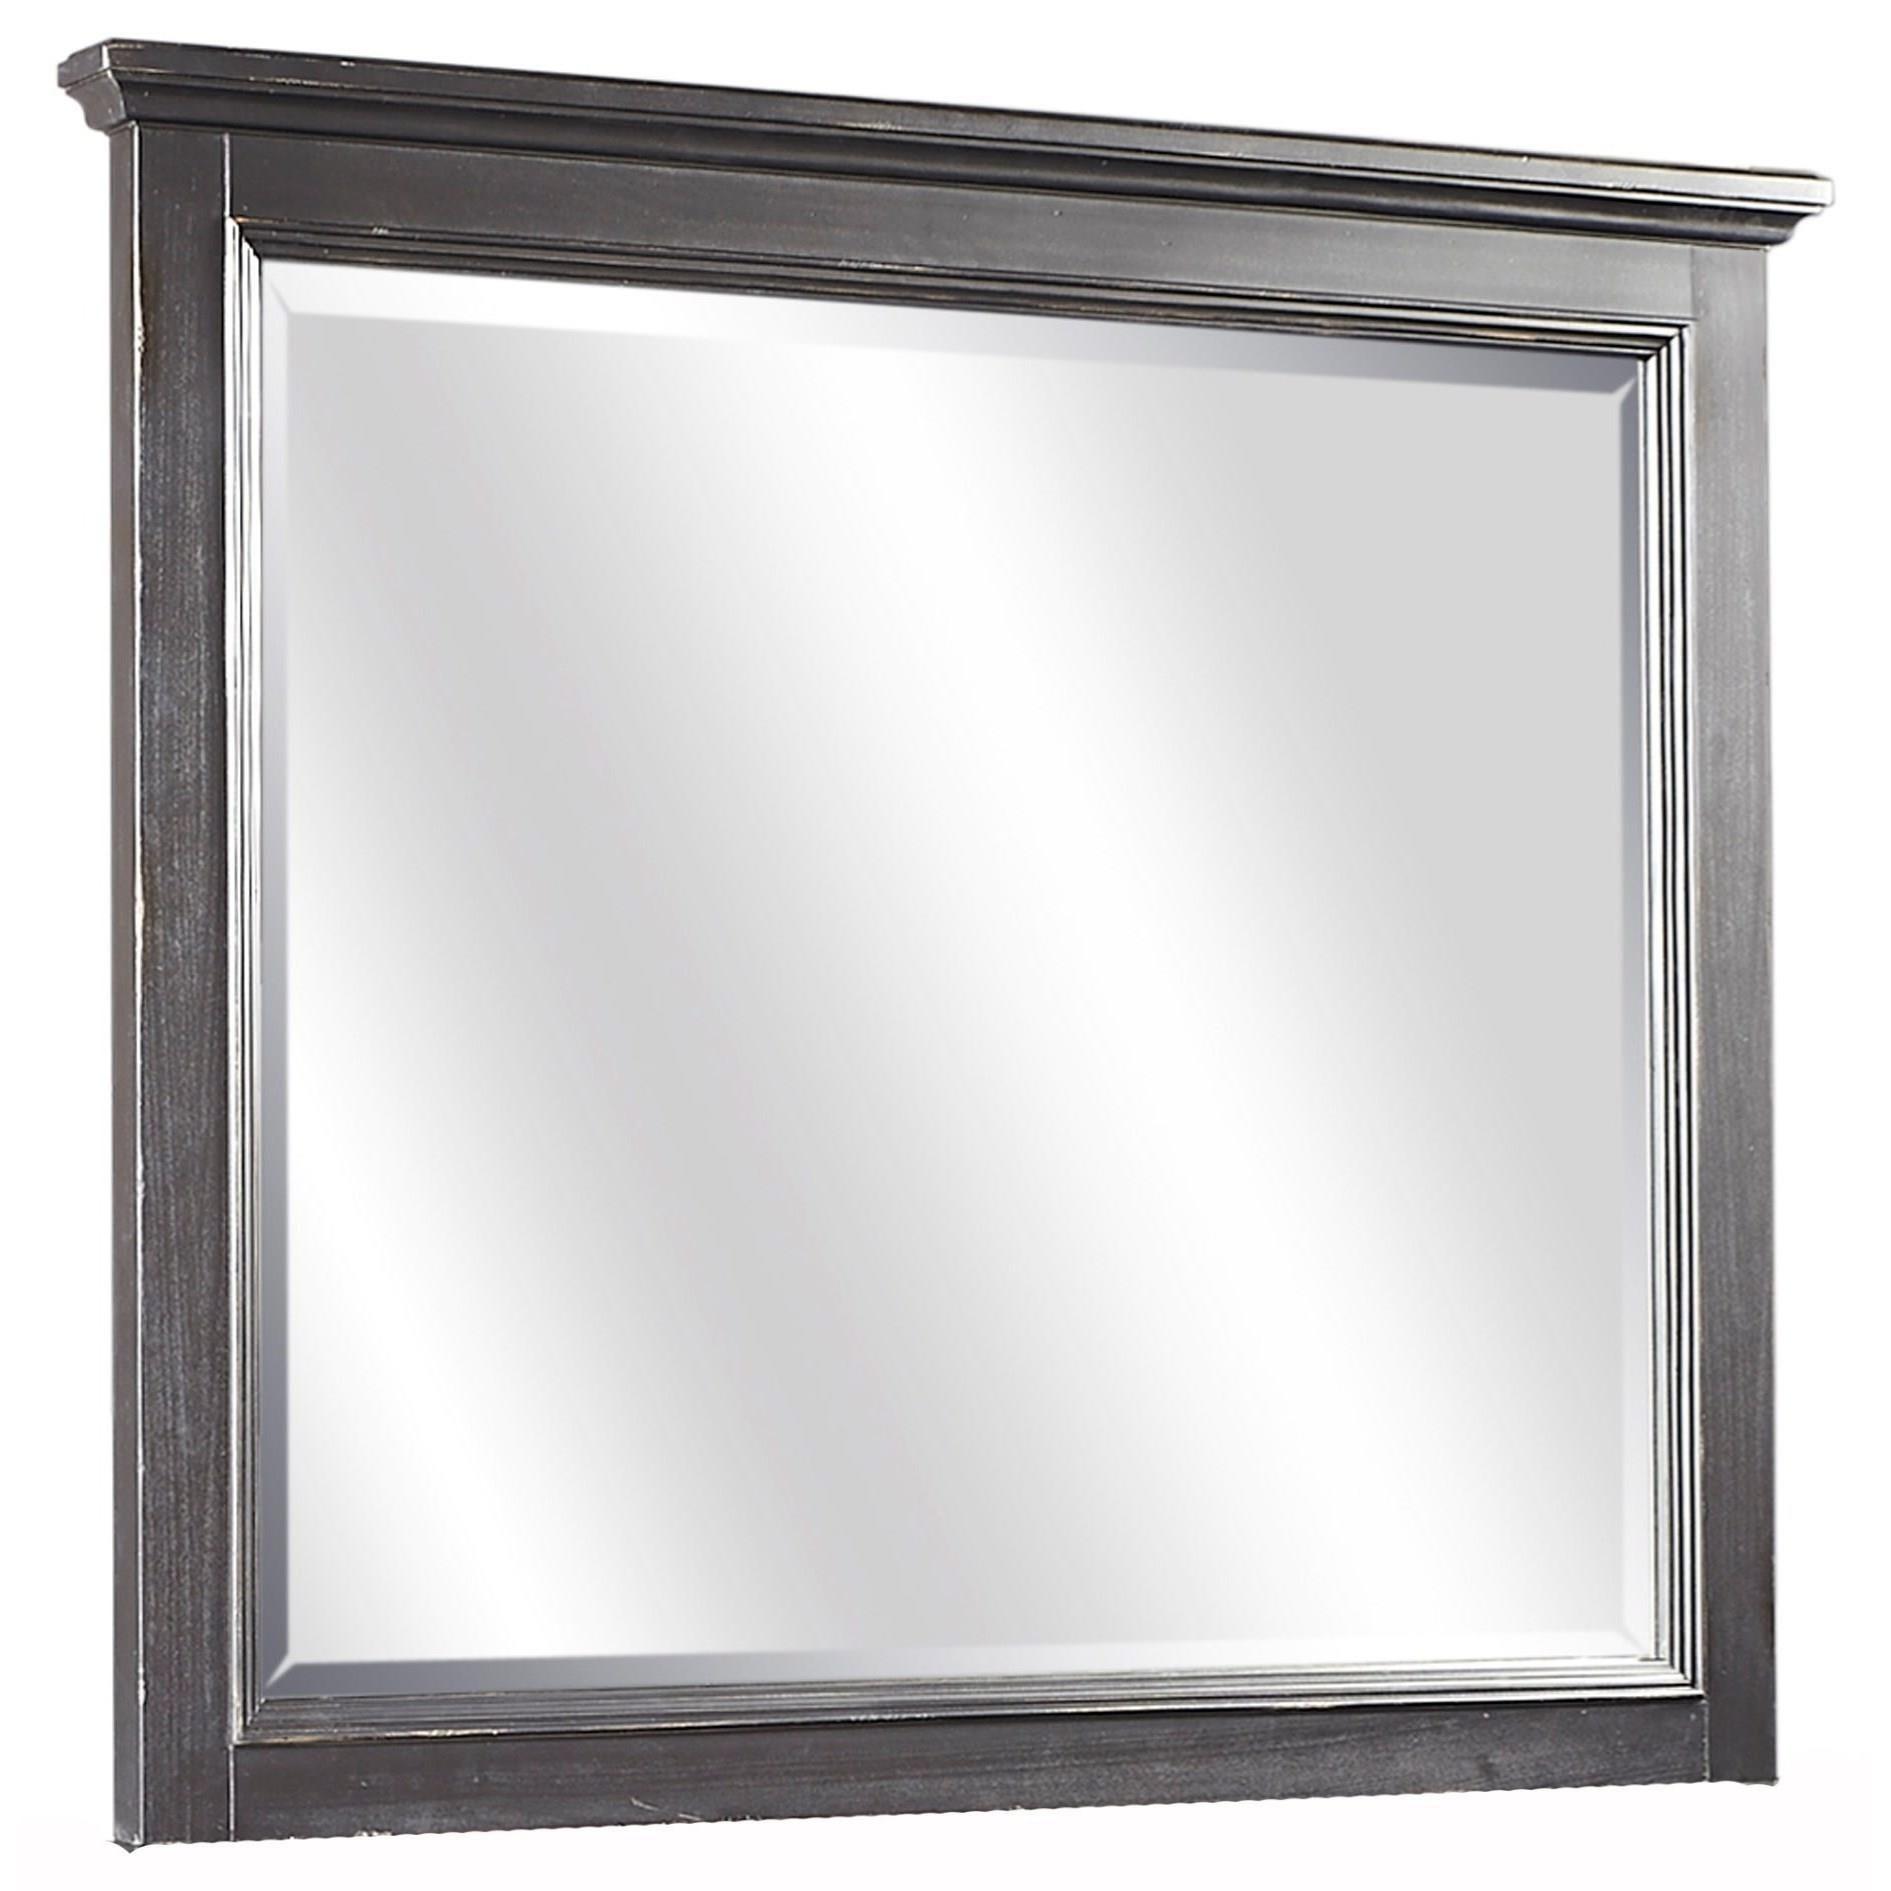 Retreat Mirror by Aspenhome at HomeWorld Furniture